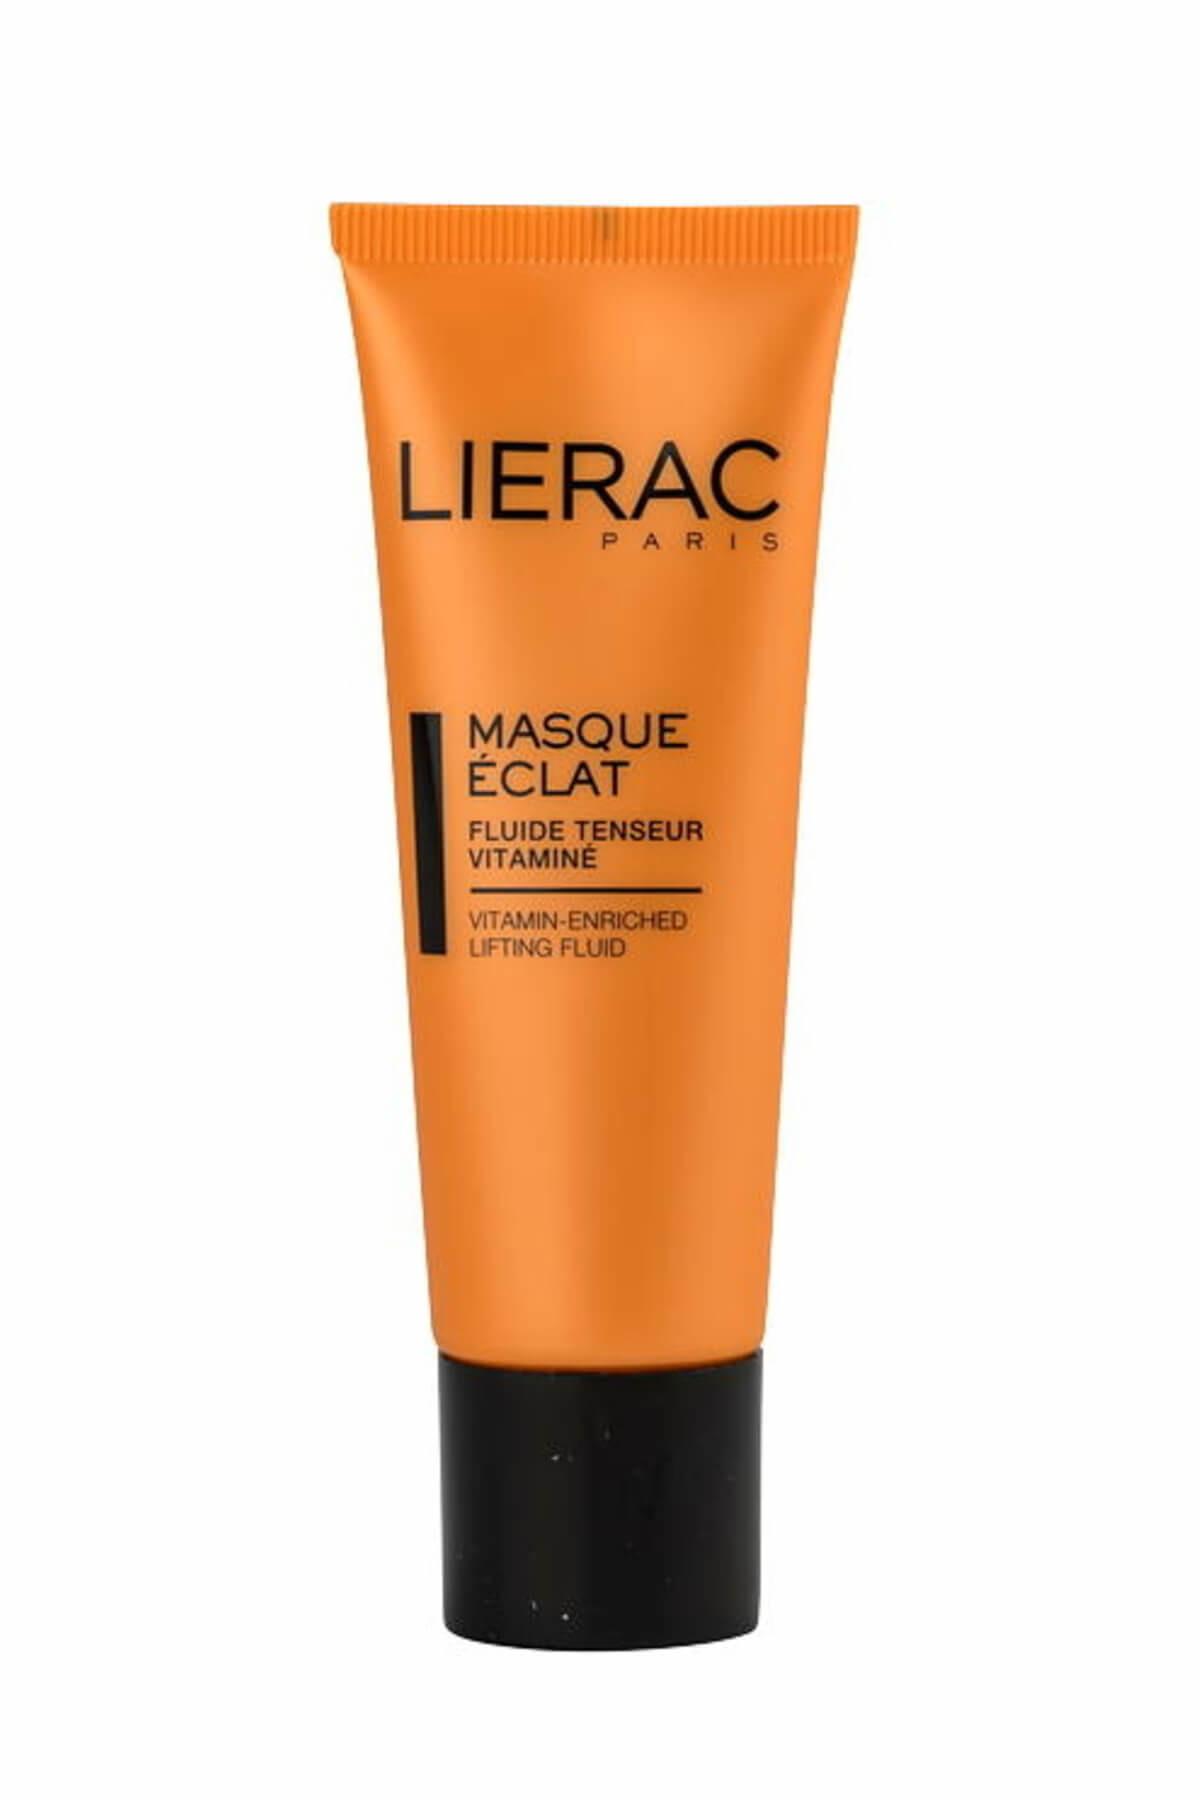 Lierac Detox Etkisi Yaratan Yenileyici Maske - Masque Eclat 50 ml 3508240294946 1